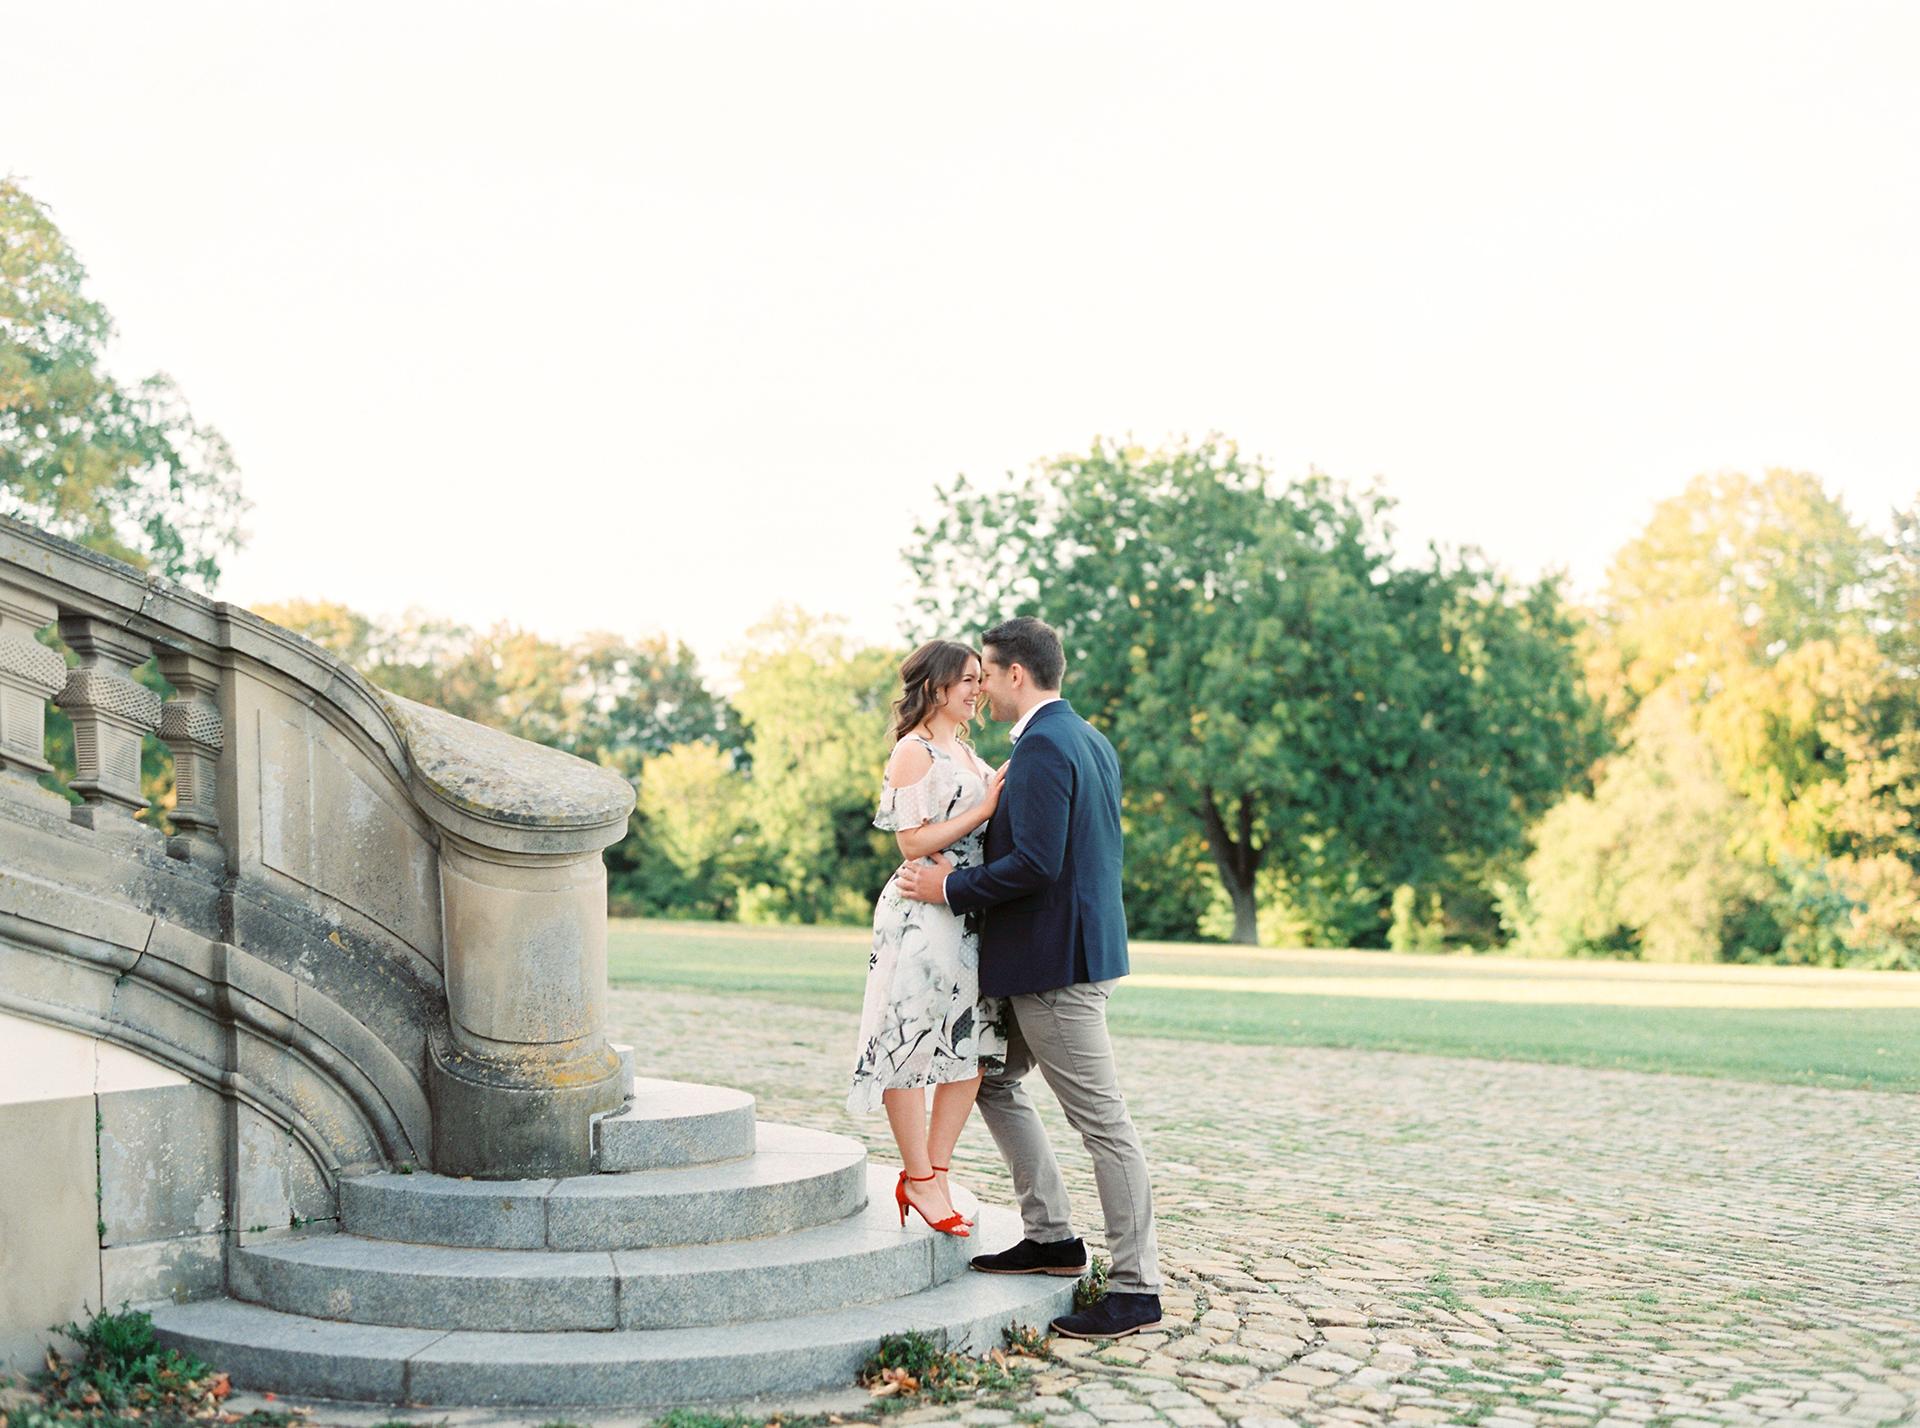 RominaSchischkeFotografie-Selina&DennisBüssing-Engagement-Bild-39